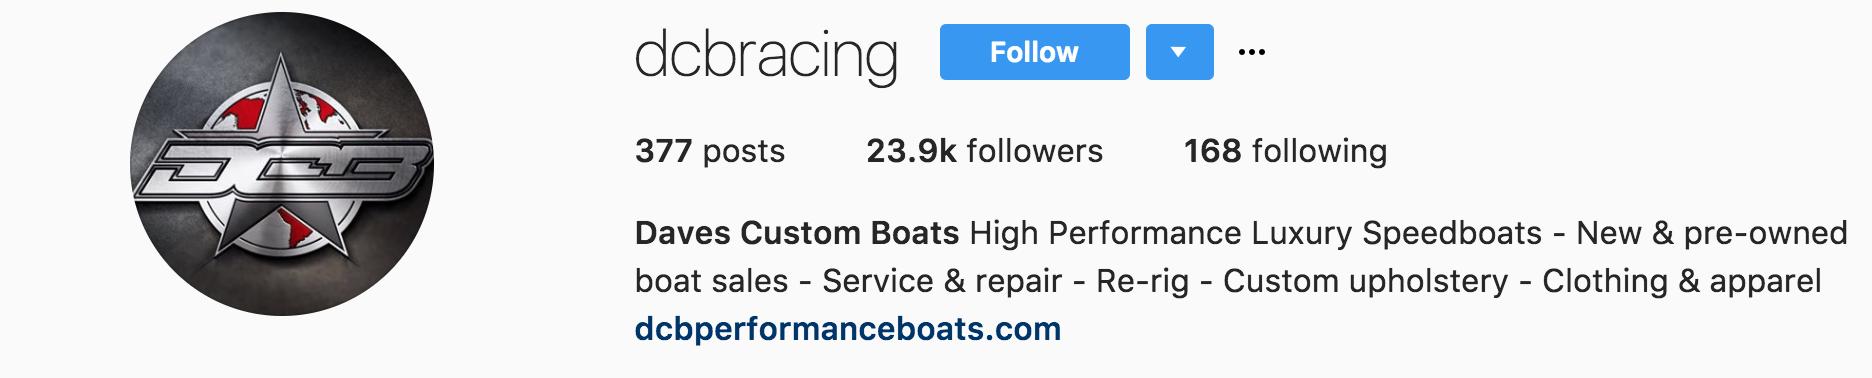 Daves Custom Boats Instagram